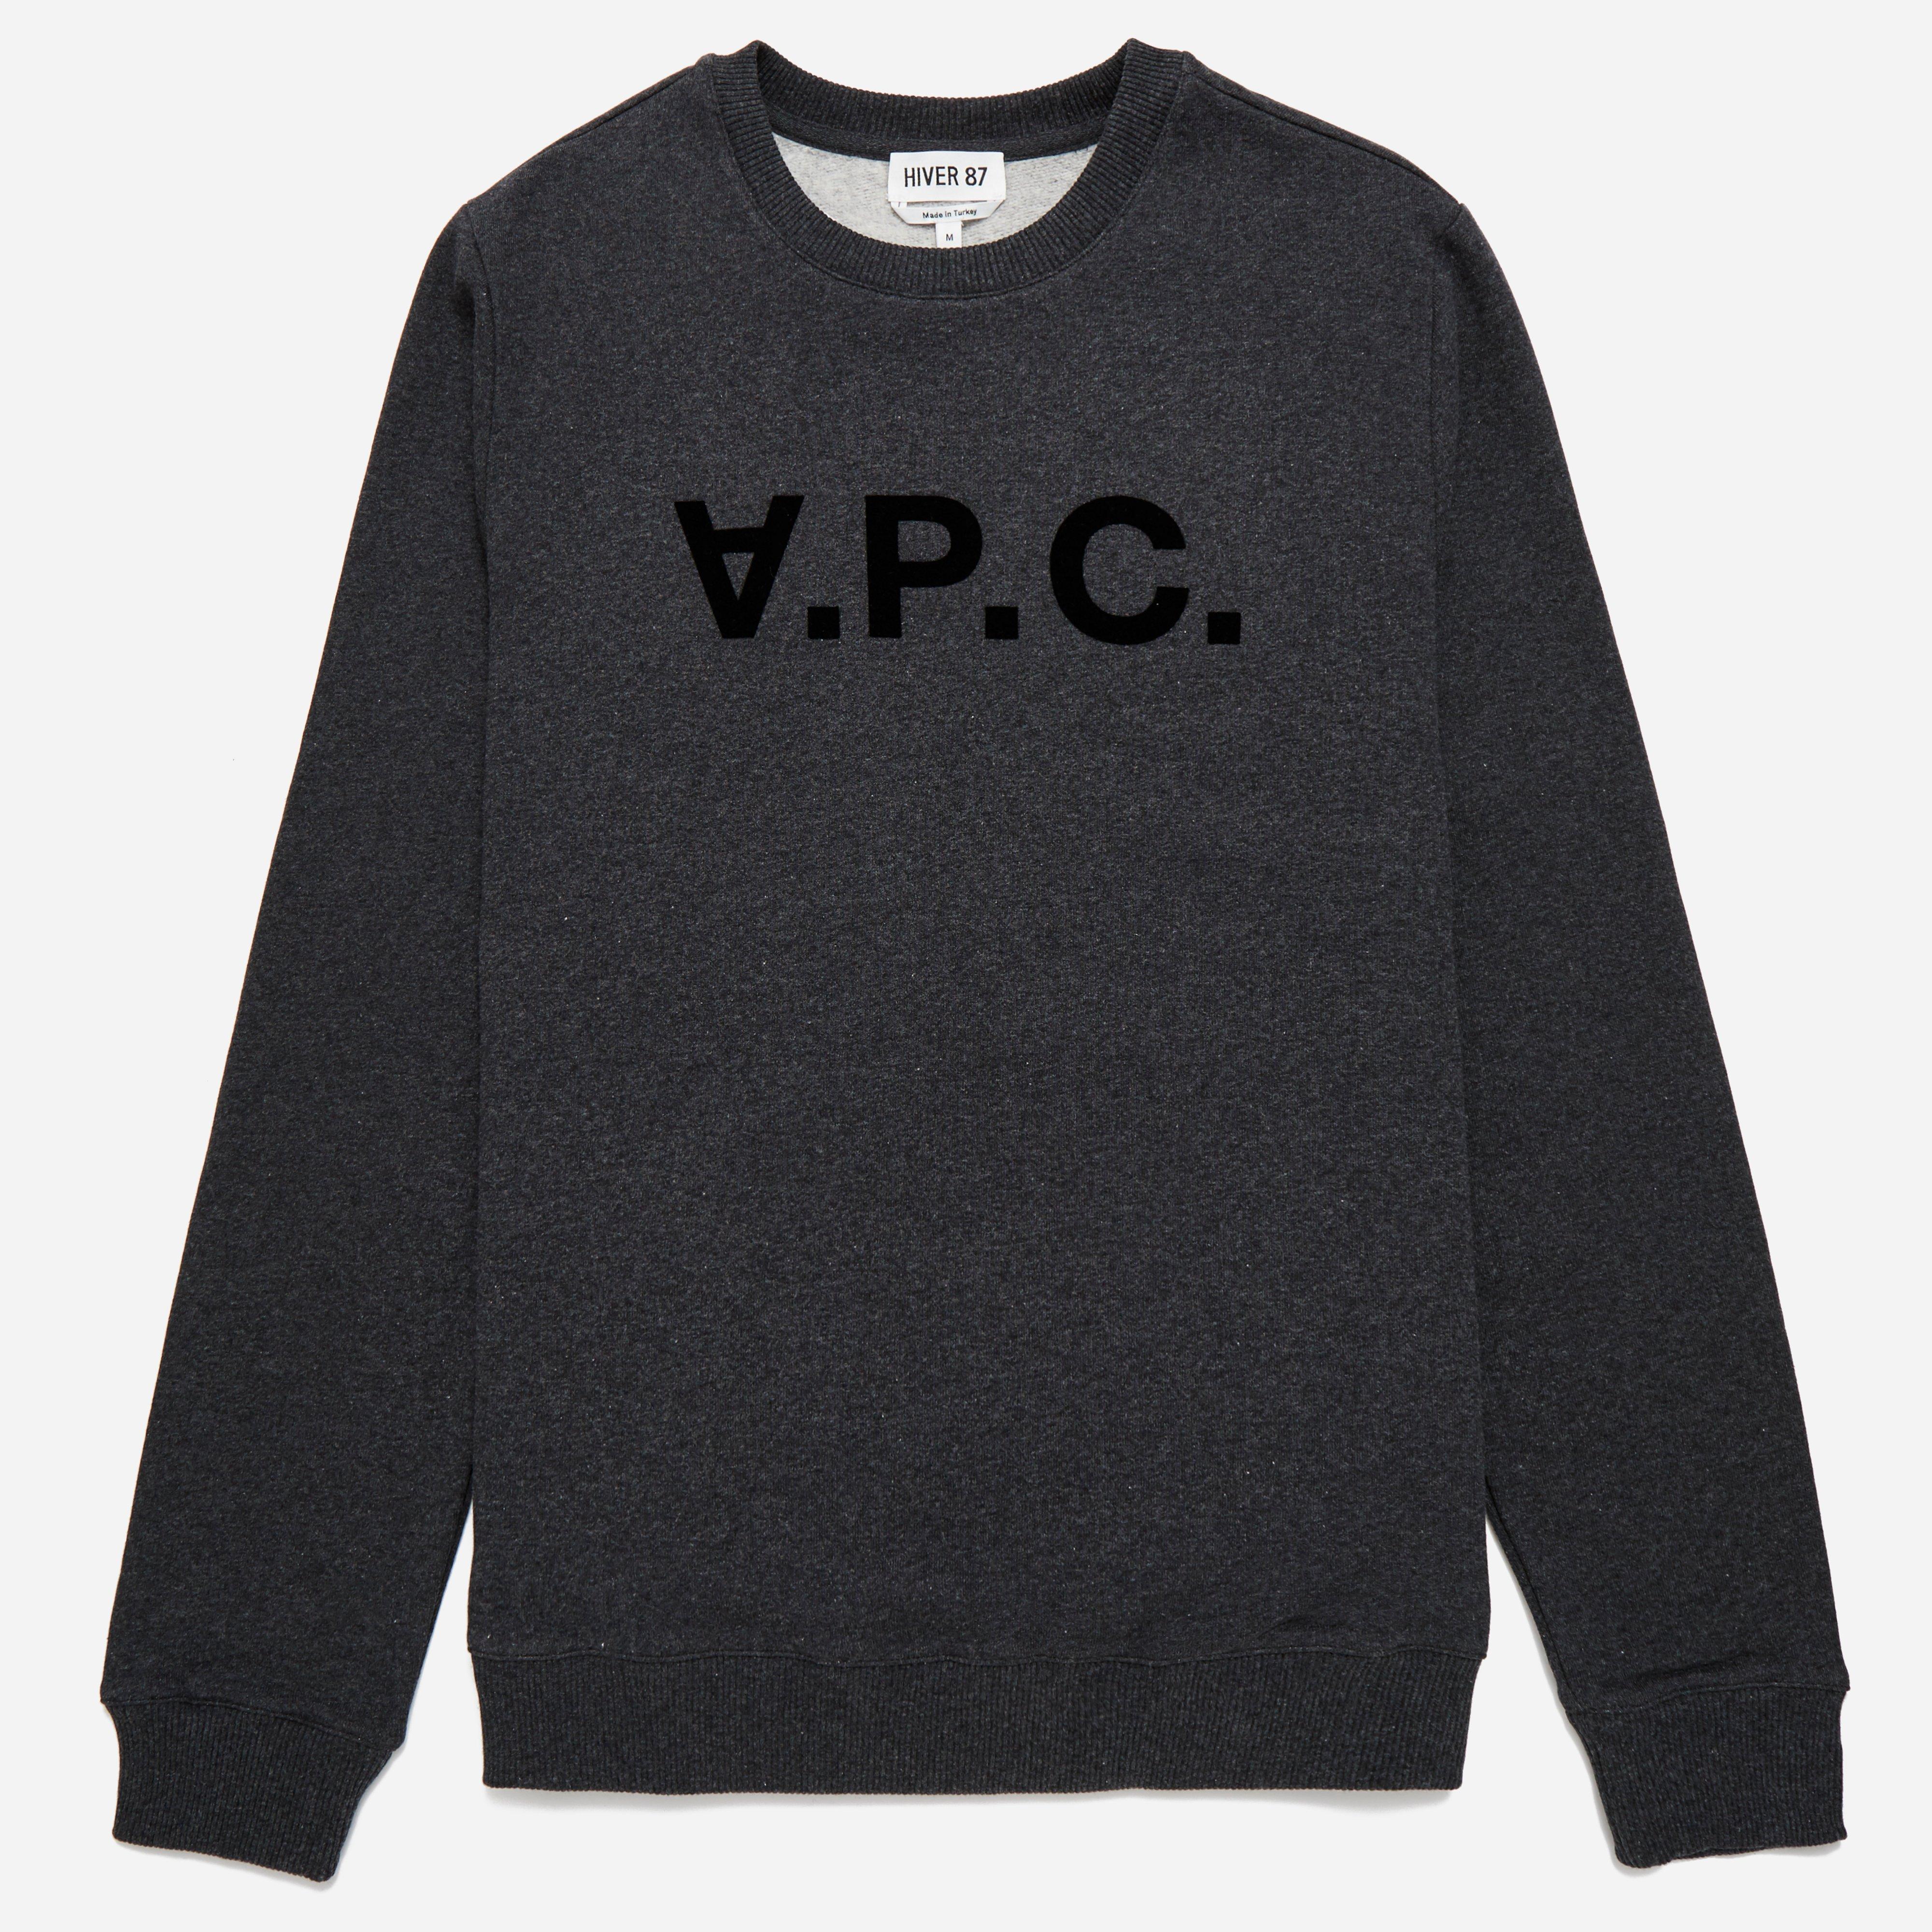 A.P.C VPC Sweatshirt